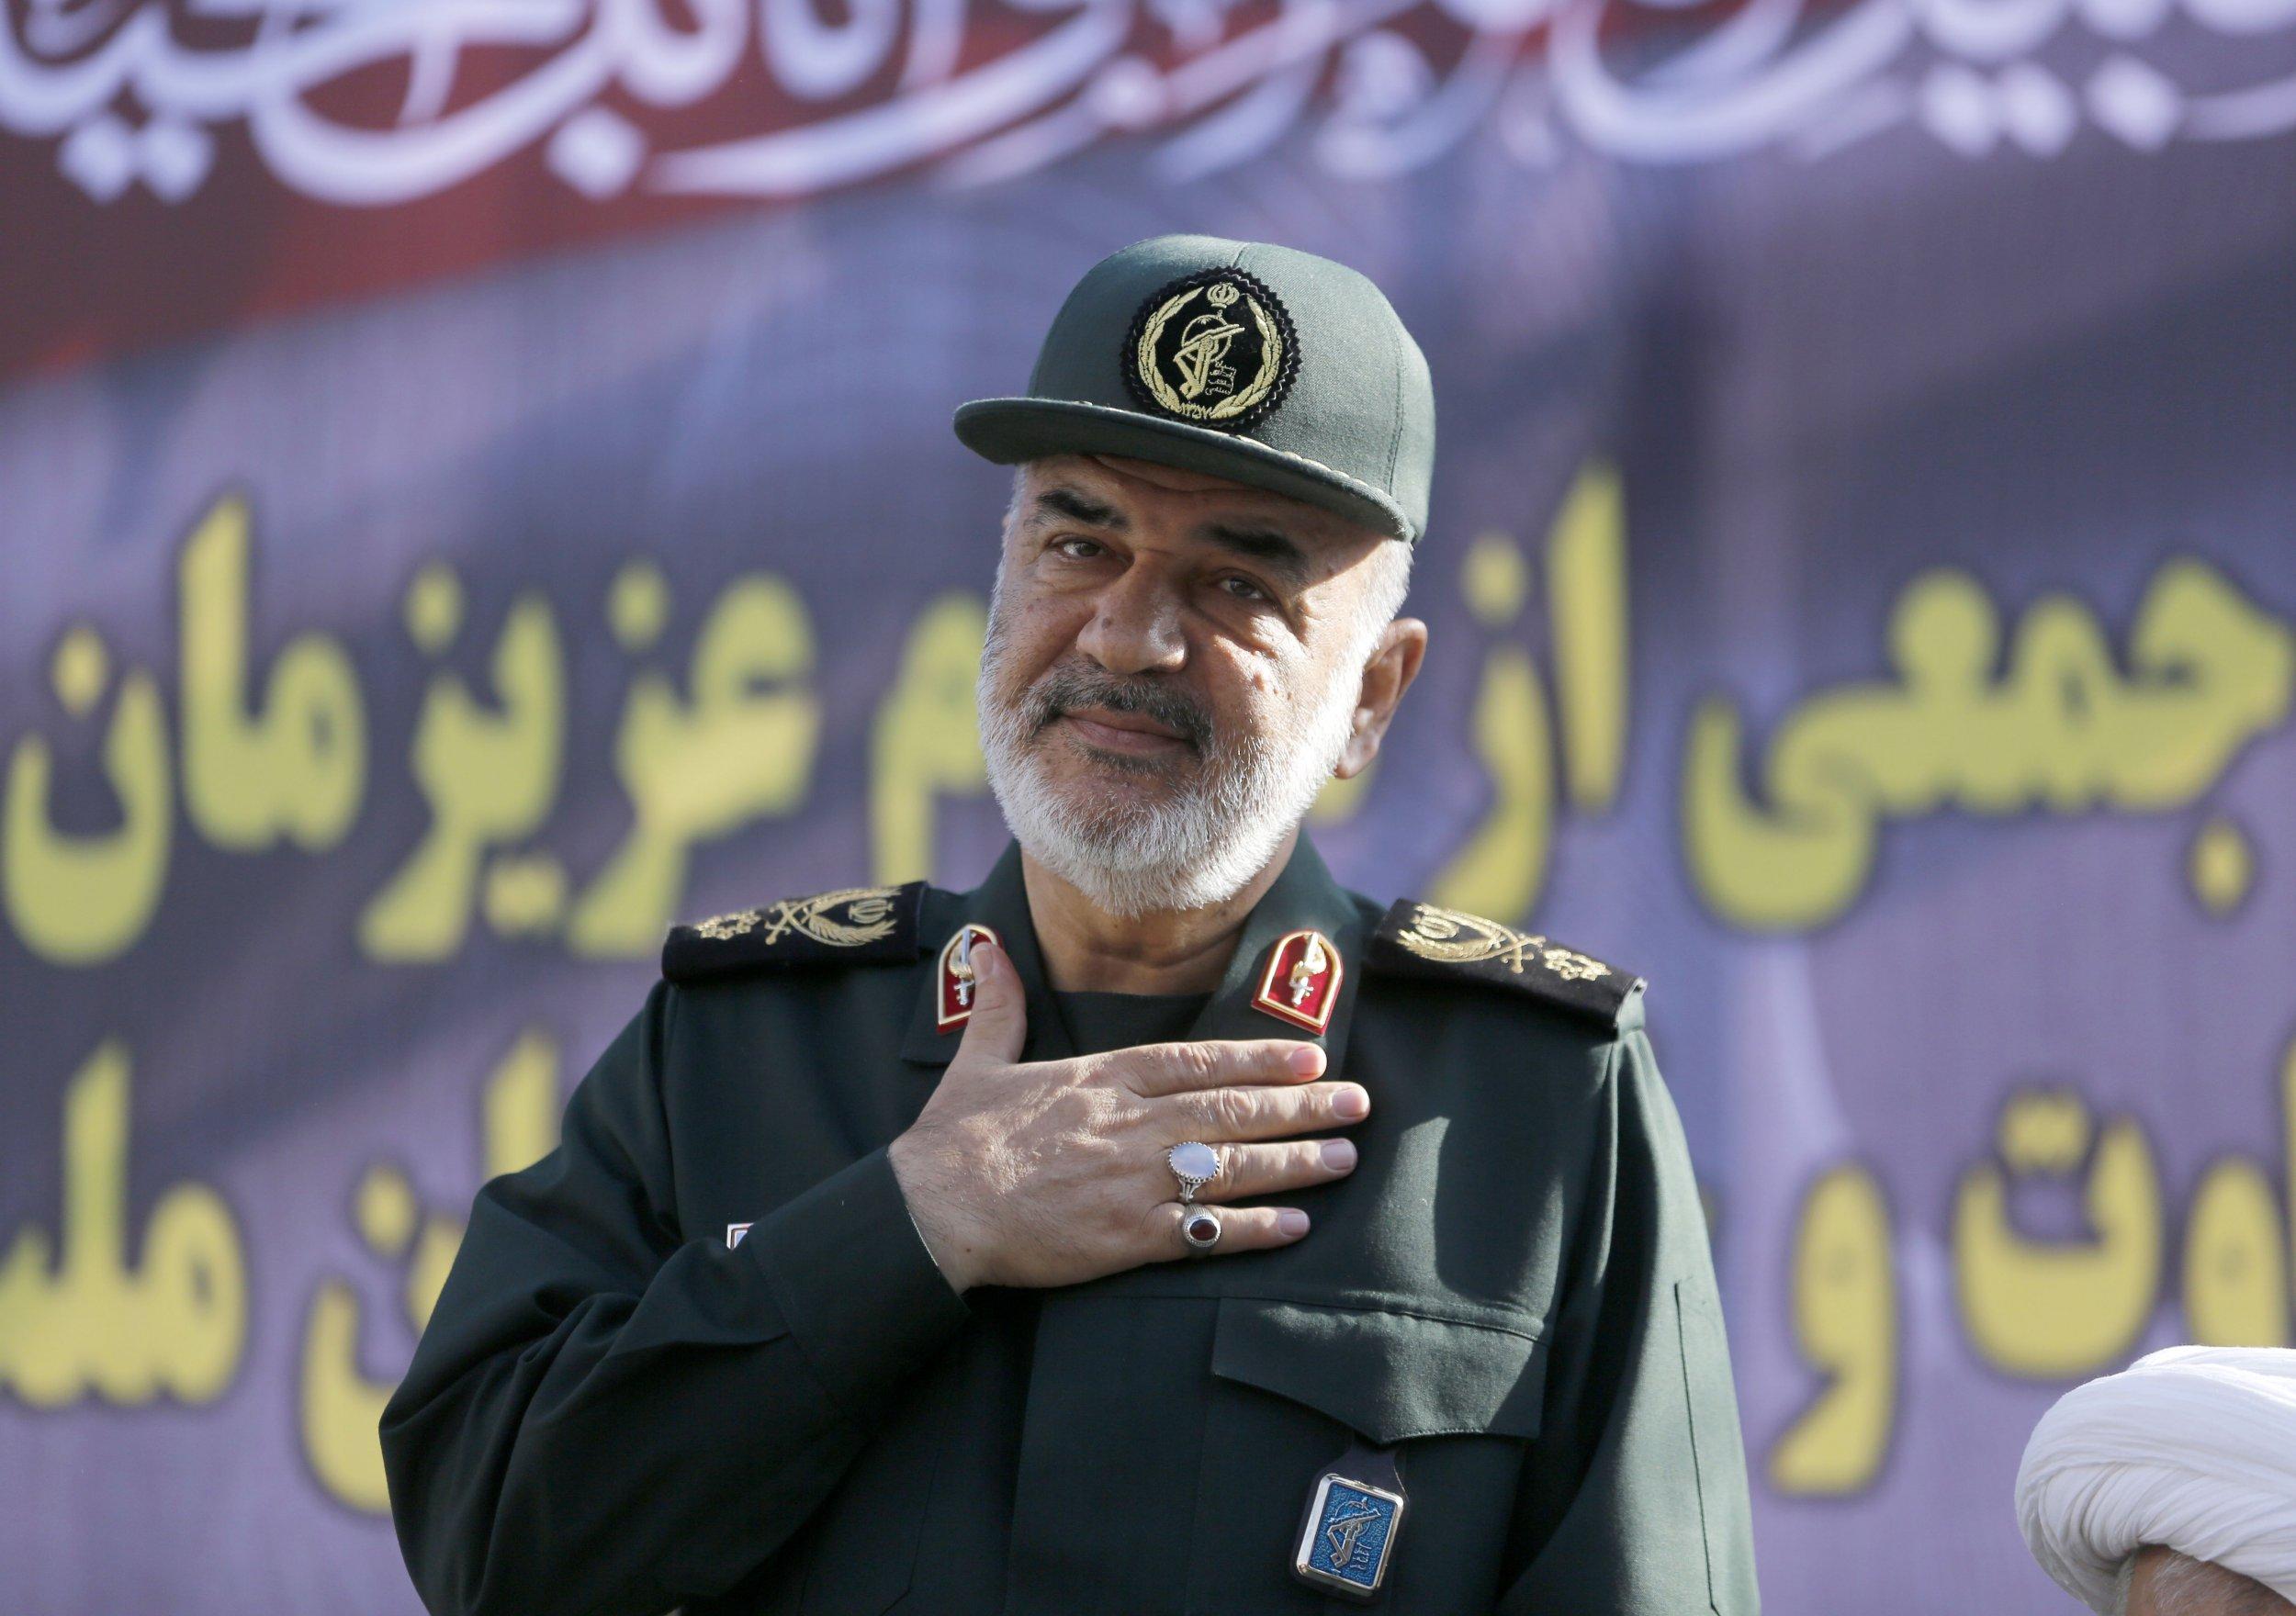 iran, military, leader, U.S., trump, revolution